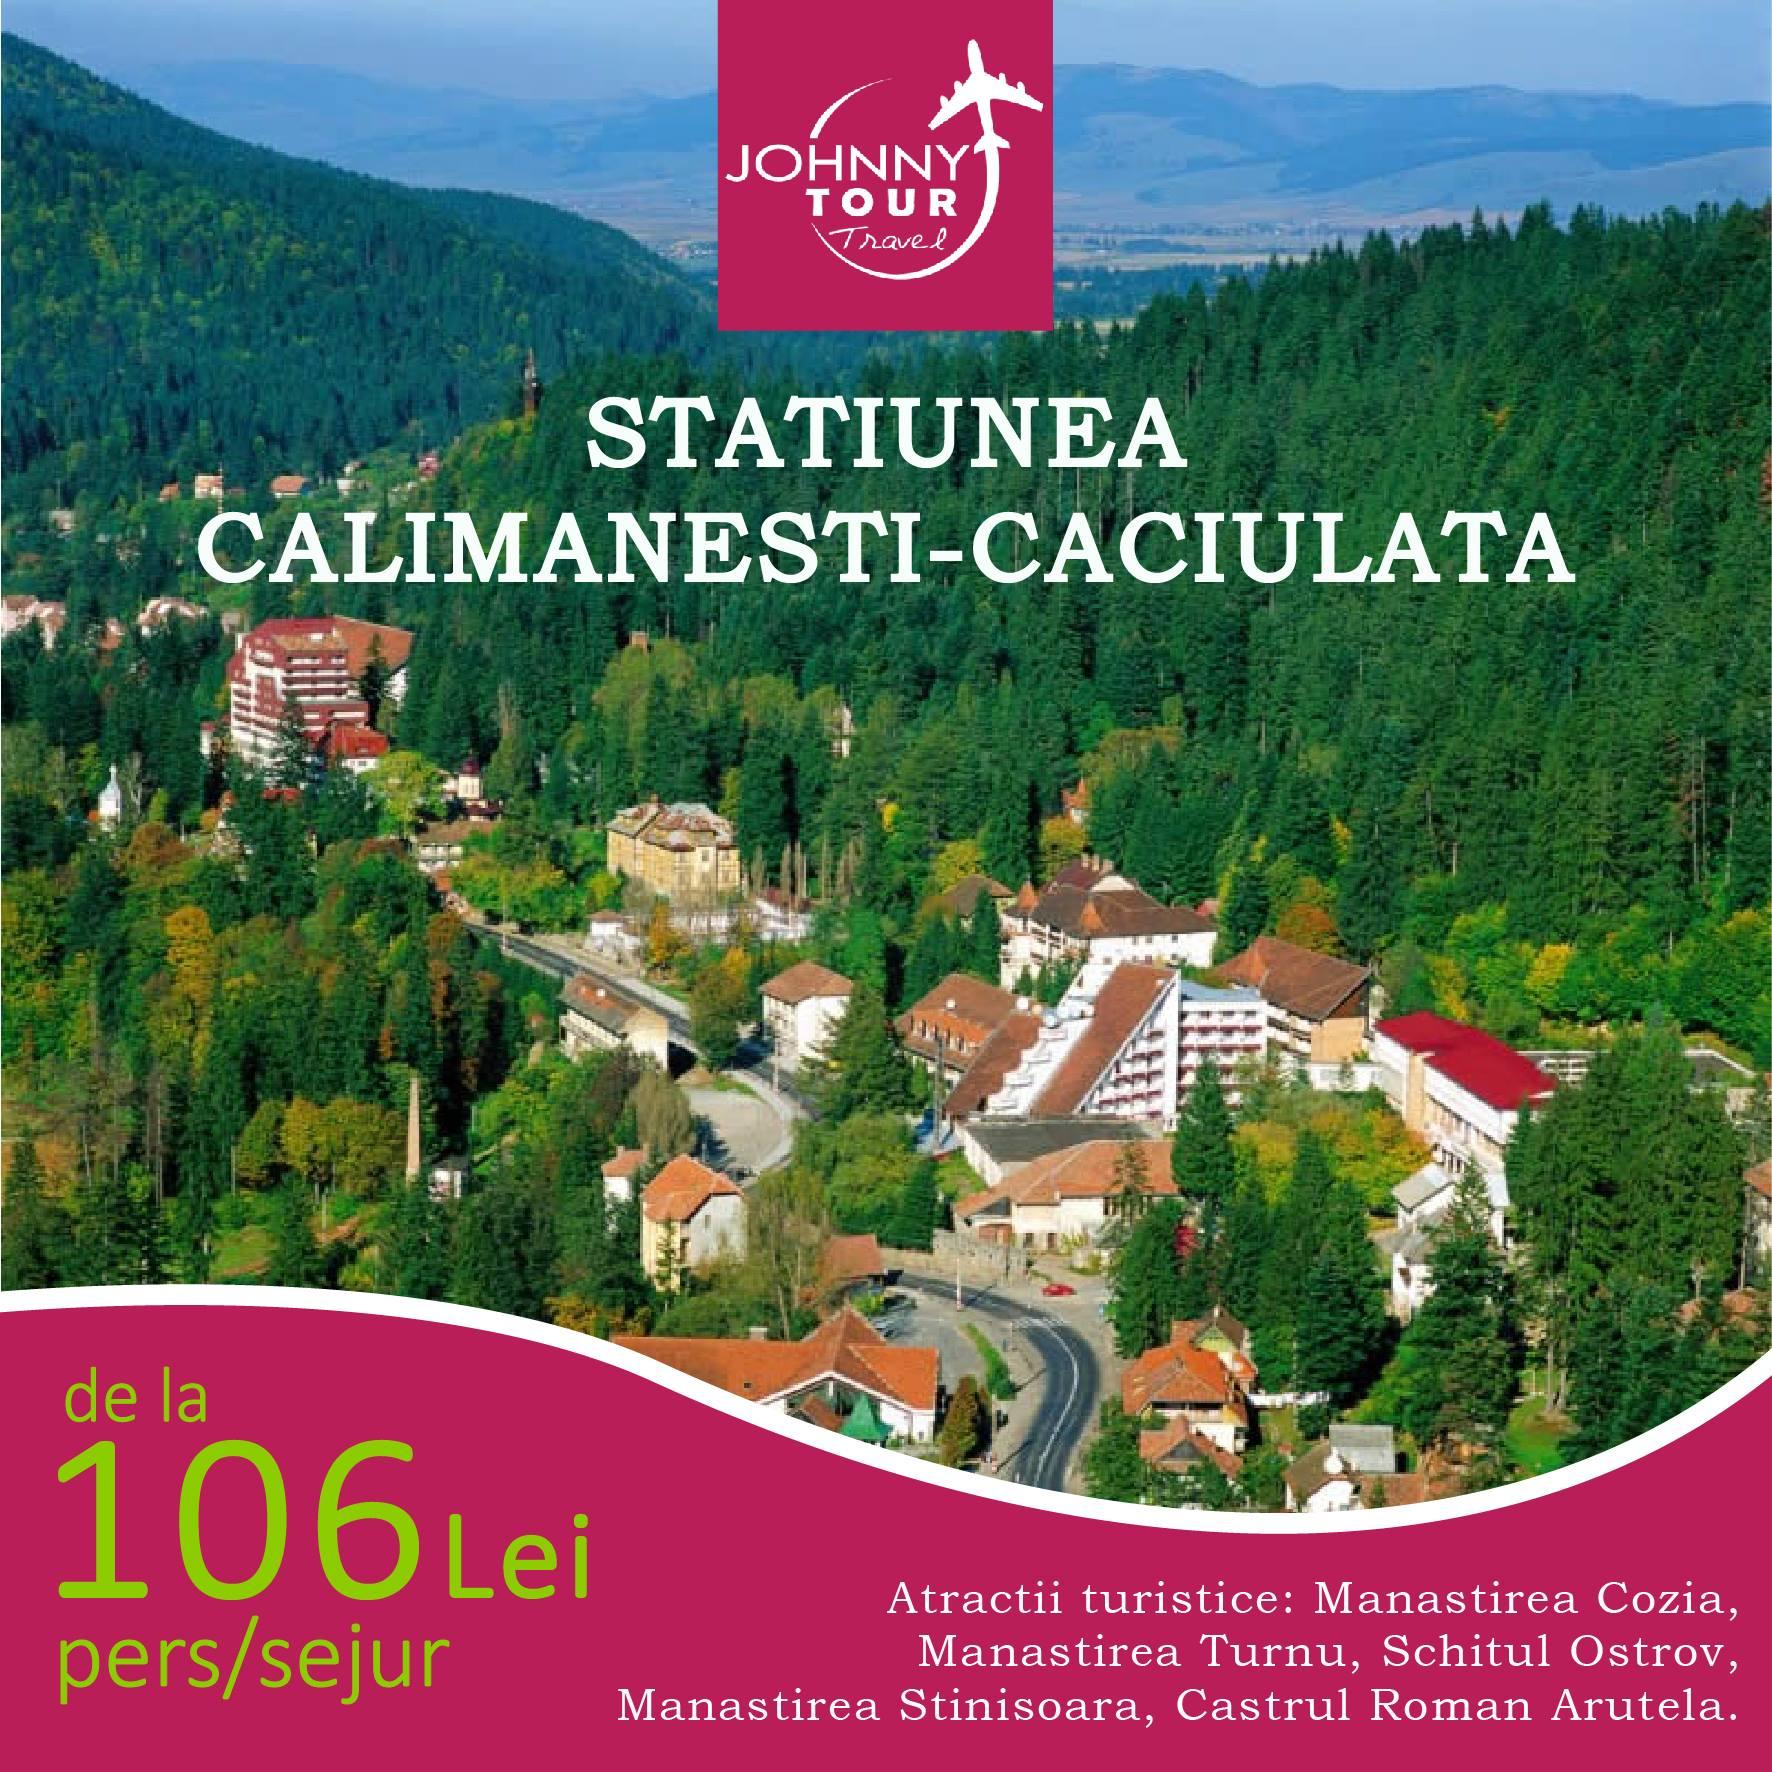 Oferta Caciulata-Calimesti